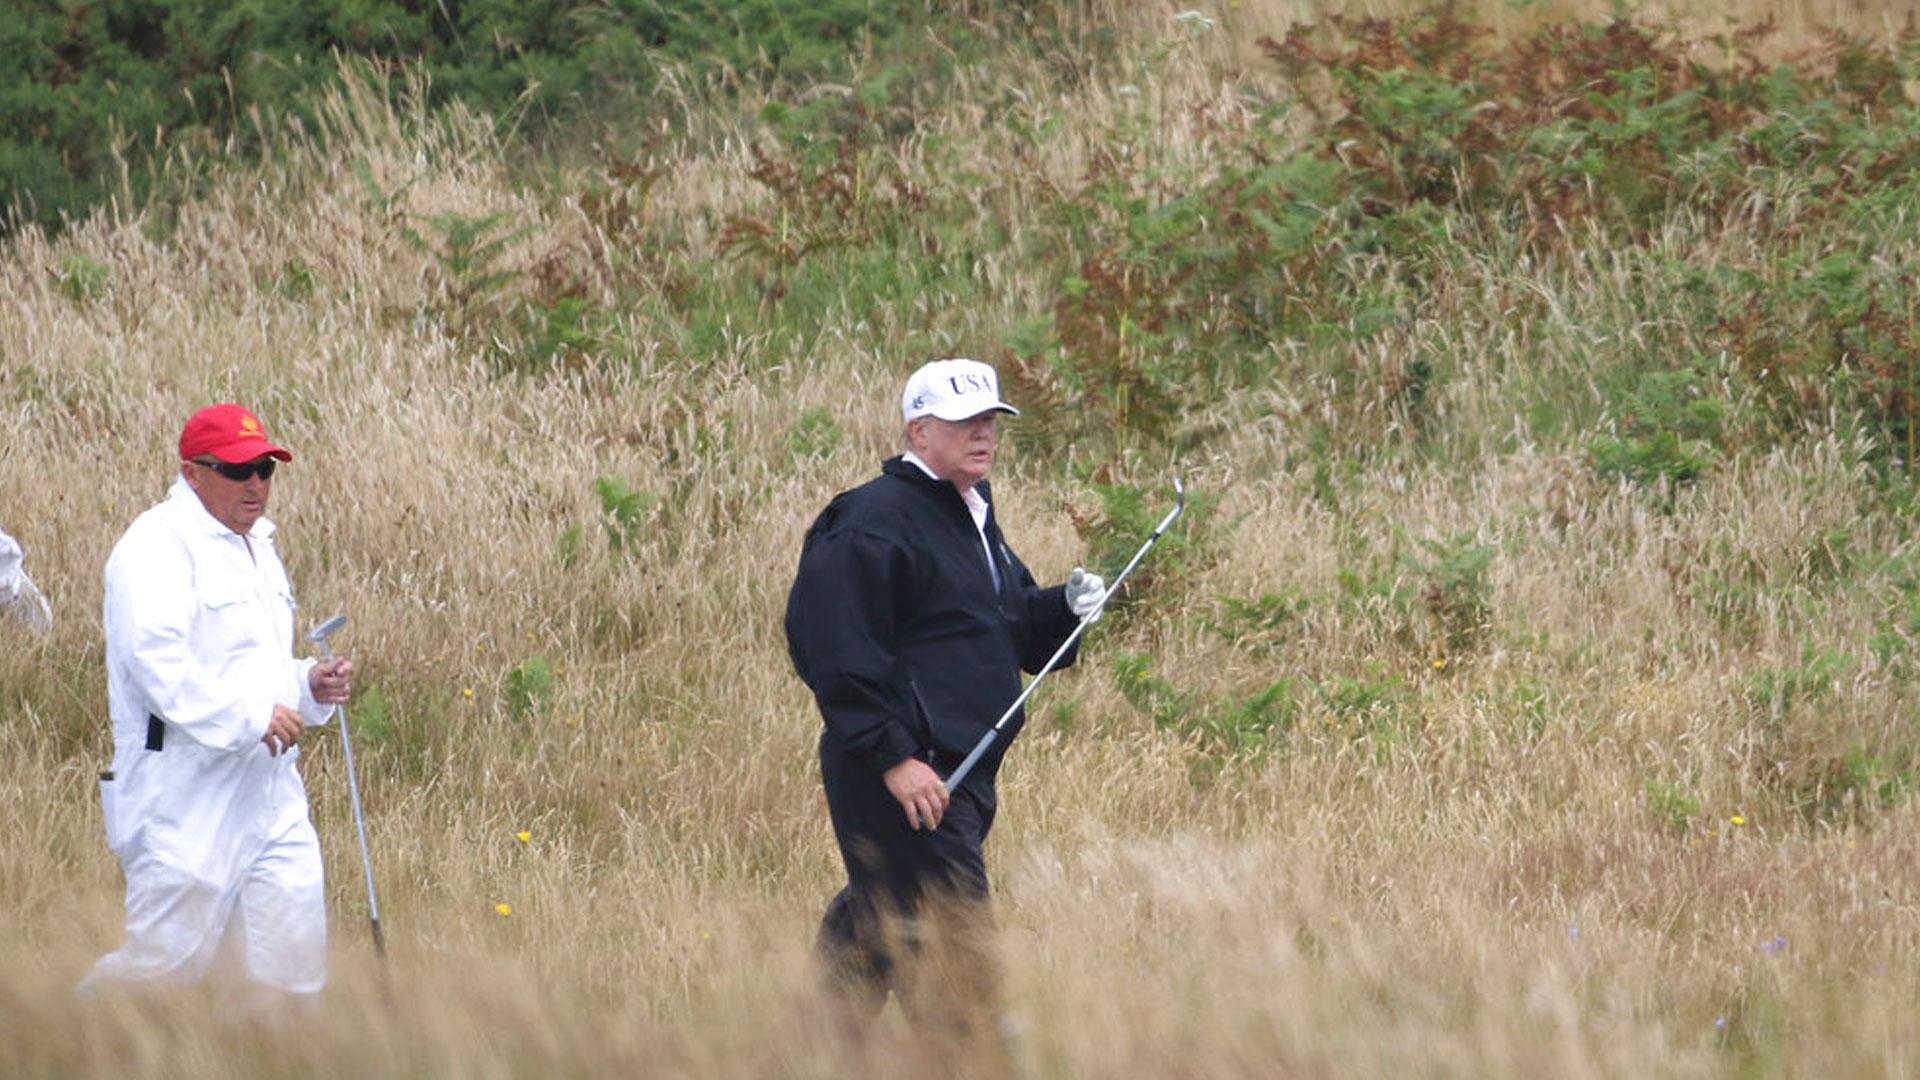 trump-golfing-scotland_1531575495051.jpg